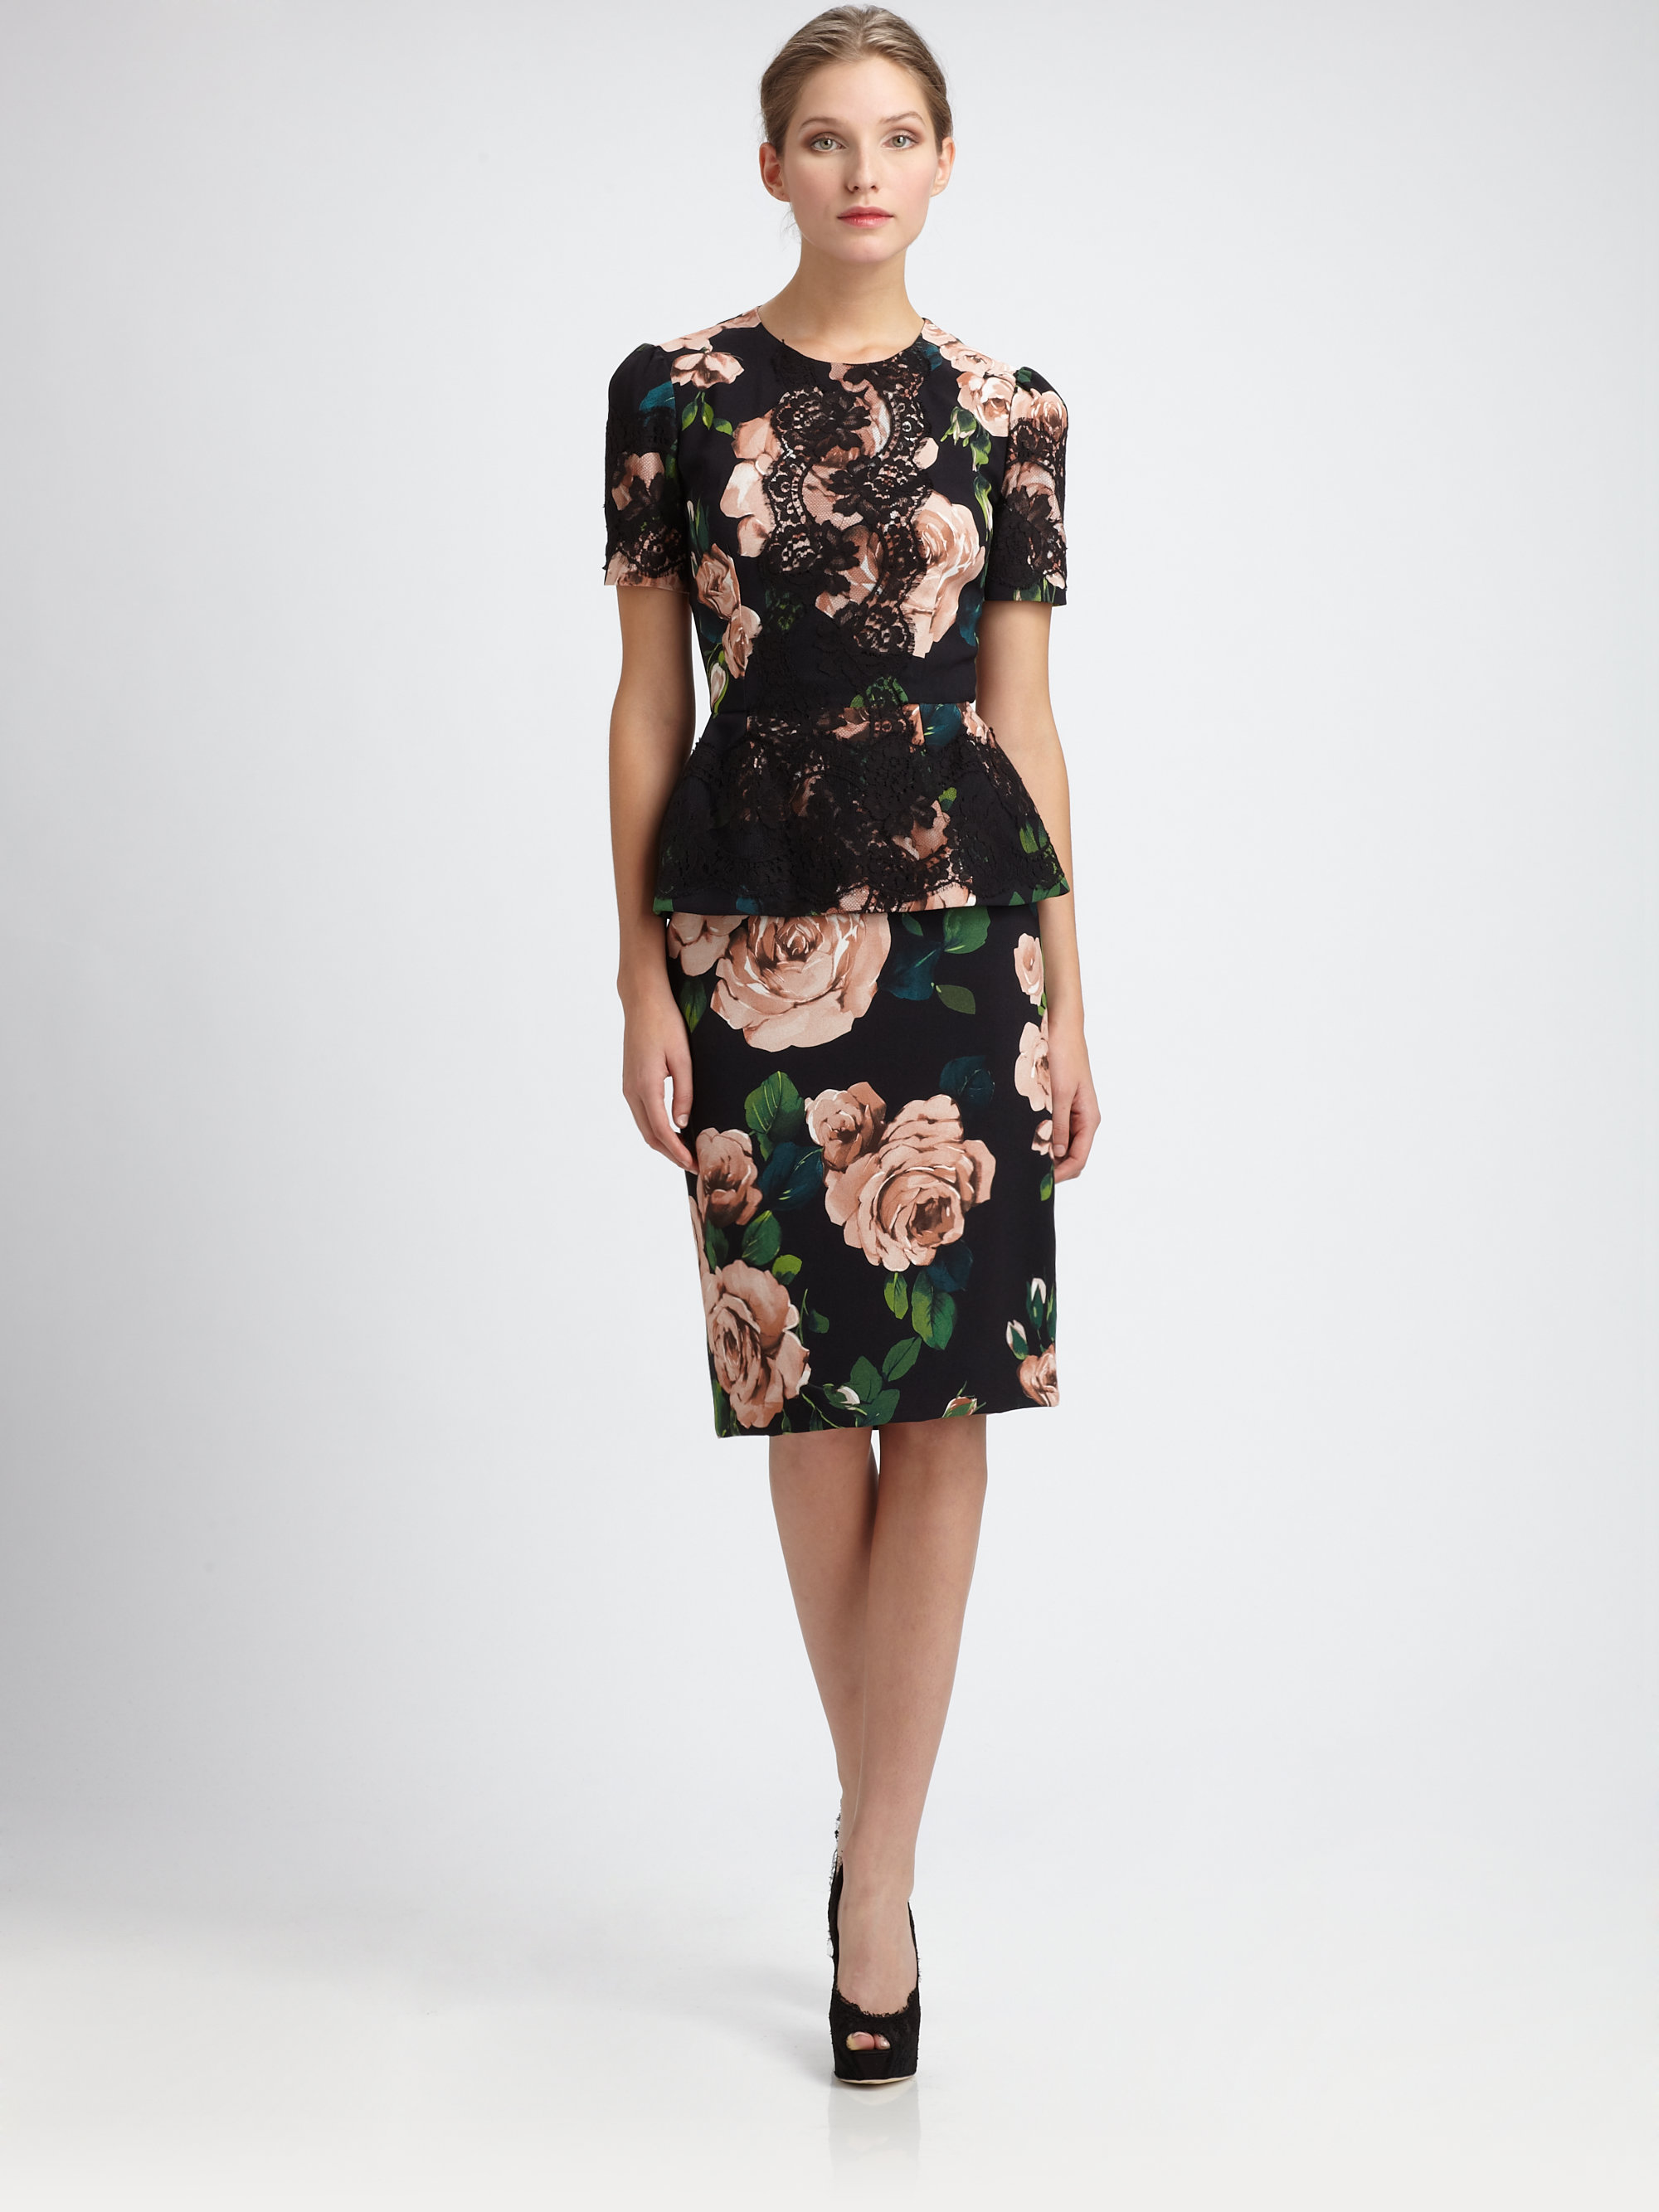 Floral Pencil Skirt | Gommap Blog